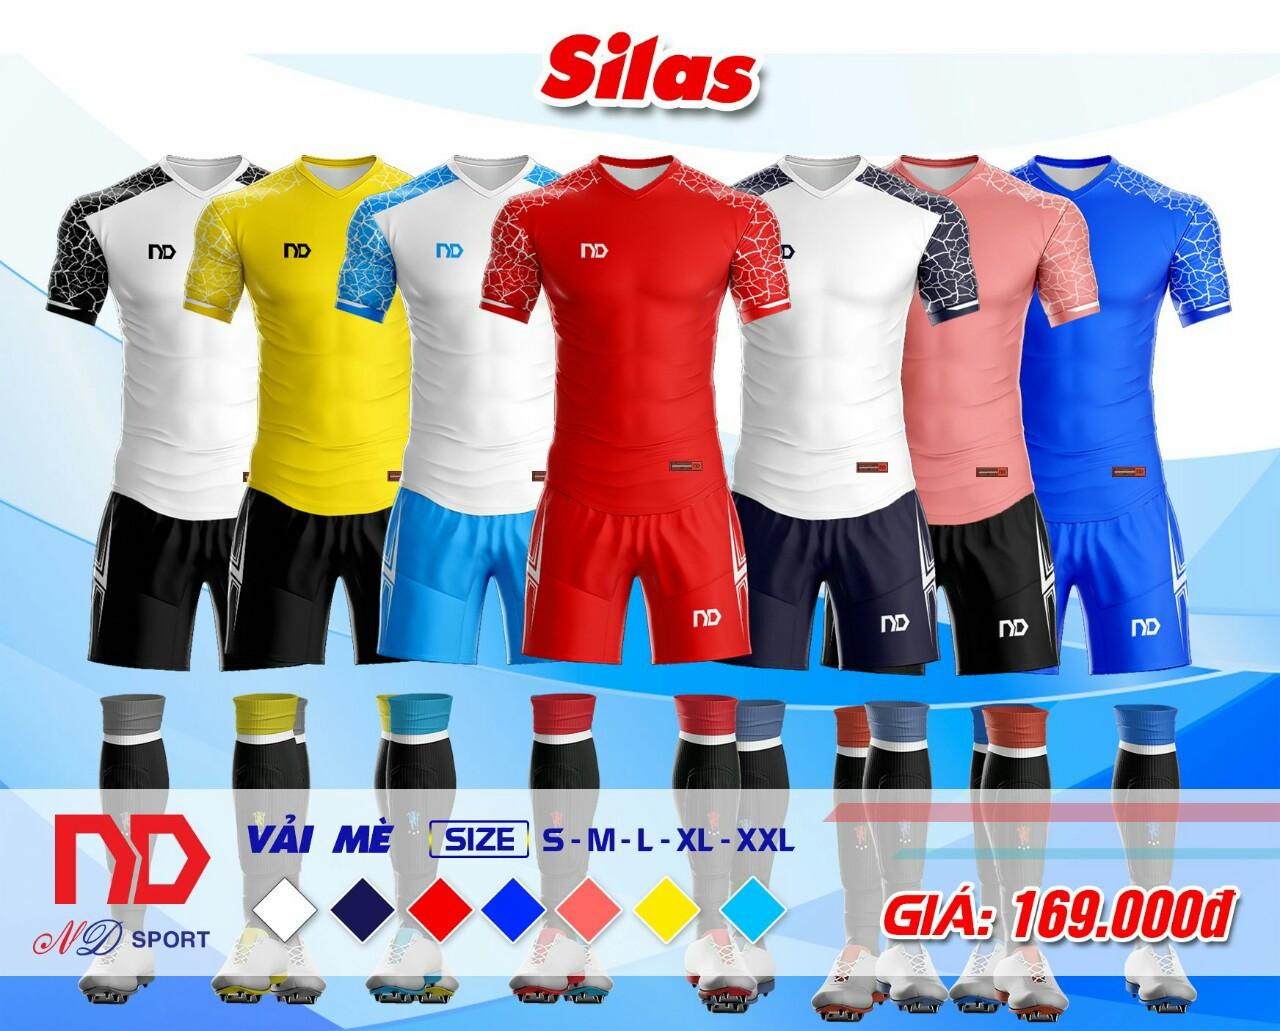 Bộ quần áo thể thao SILAS